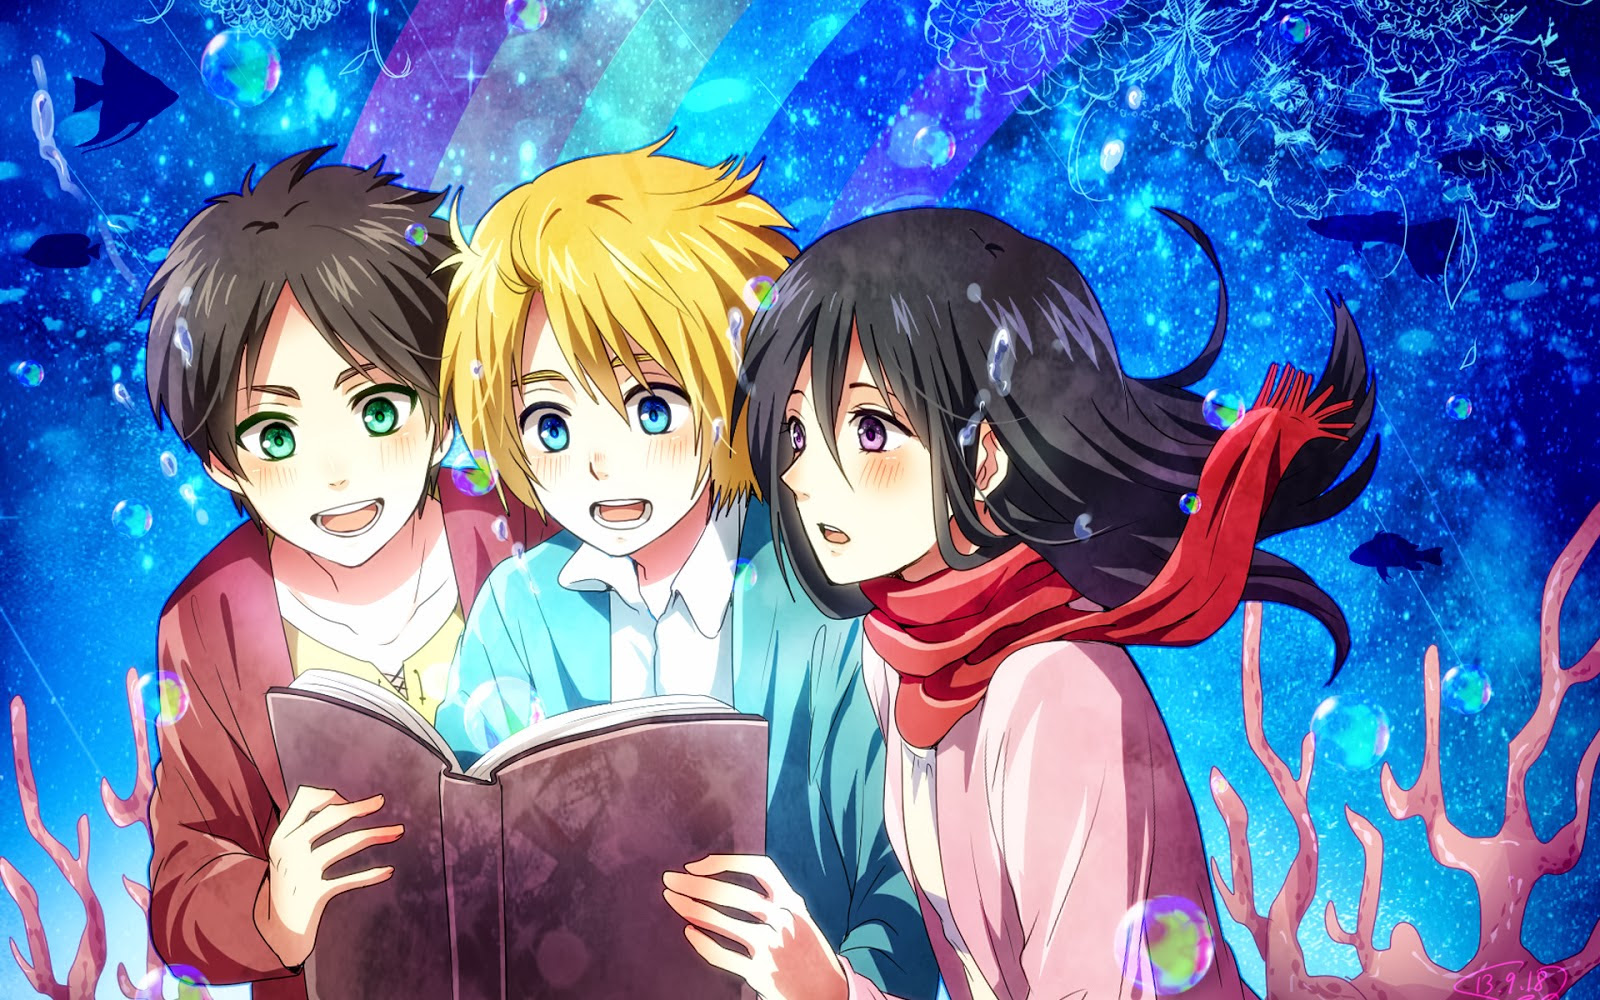 Eren Mikasa And Armin Shingeki No Kyojin Attack On Titan Fan Art 36841548 Fanpop